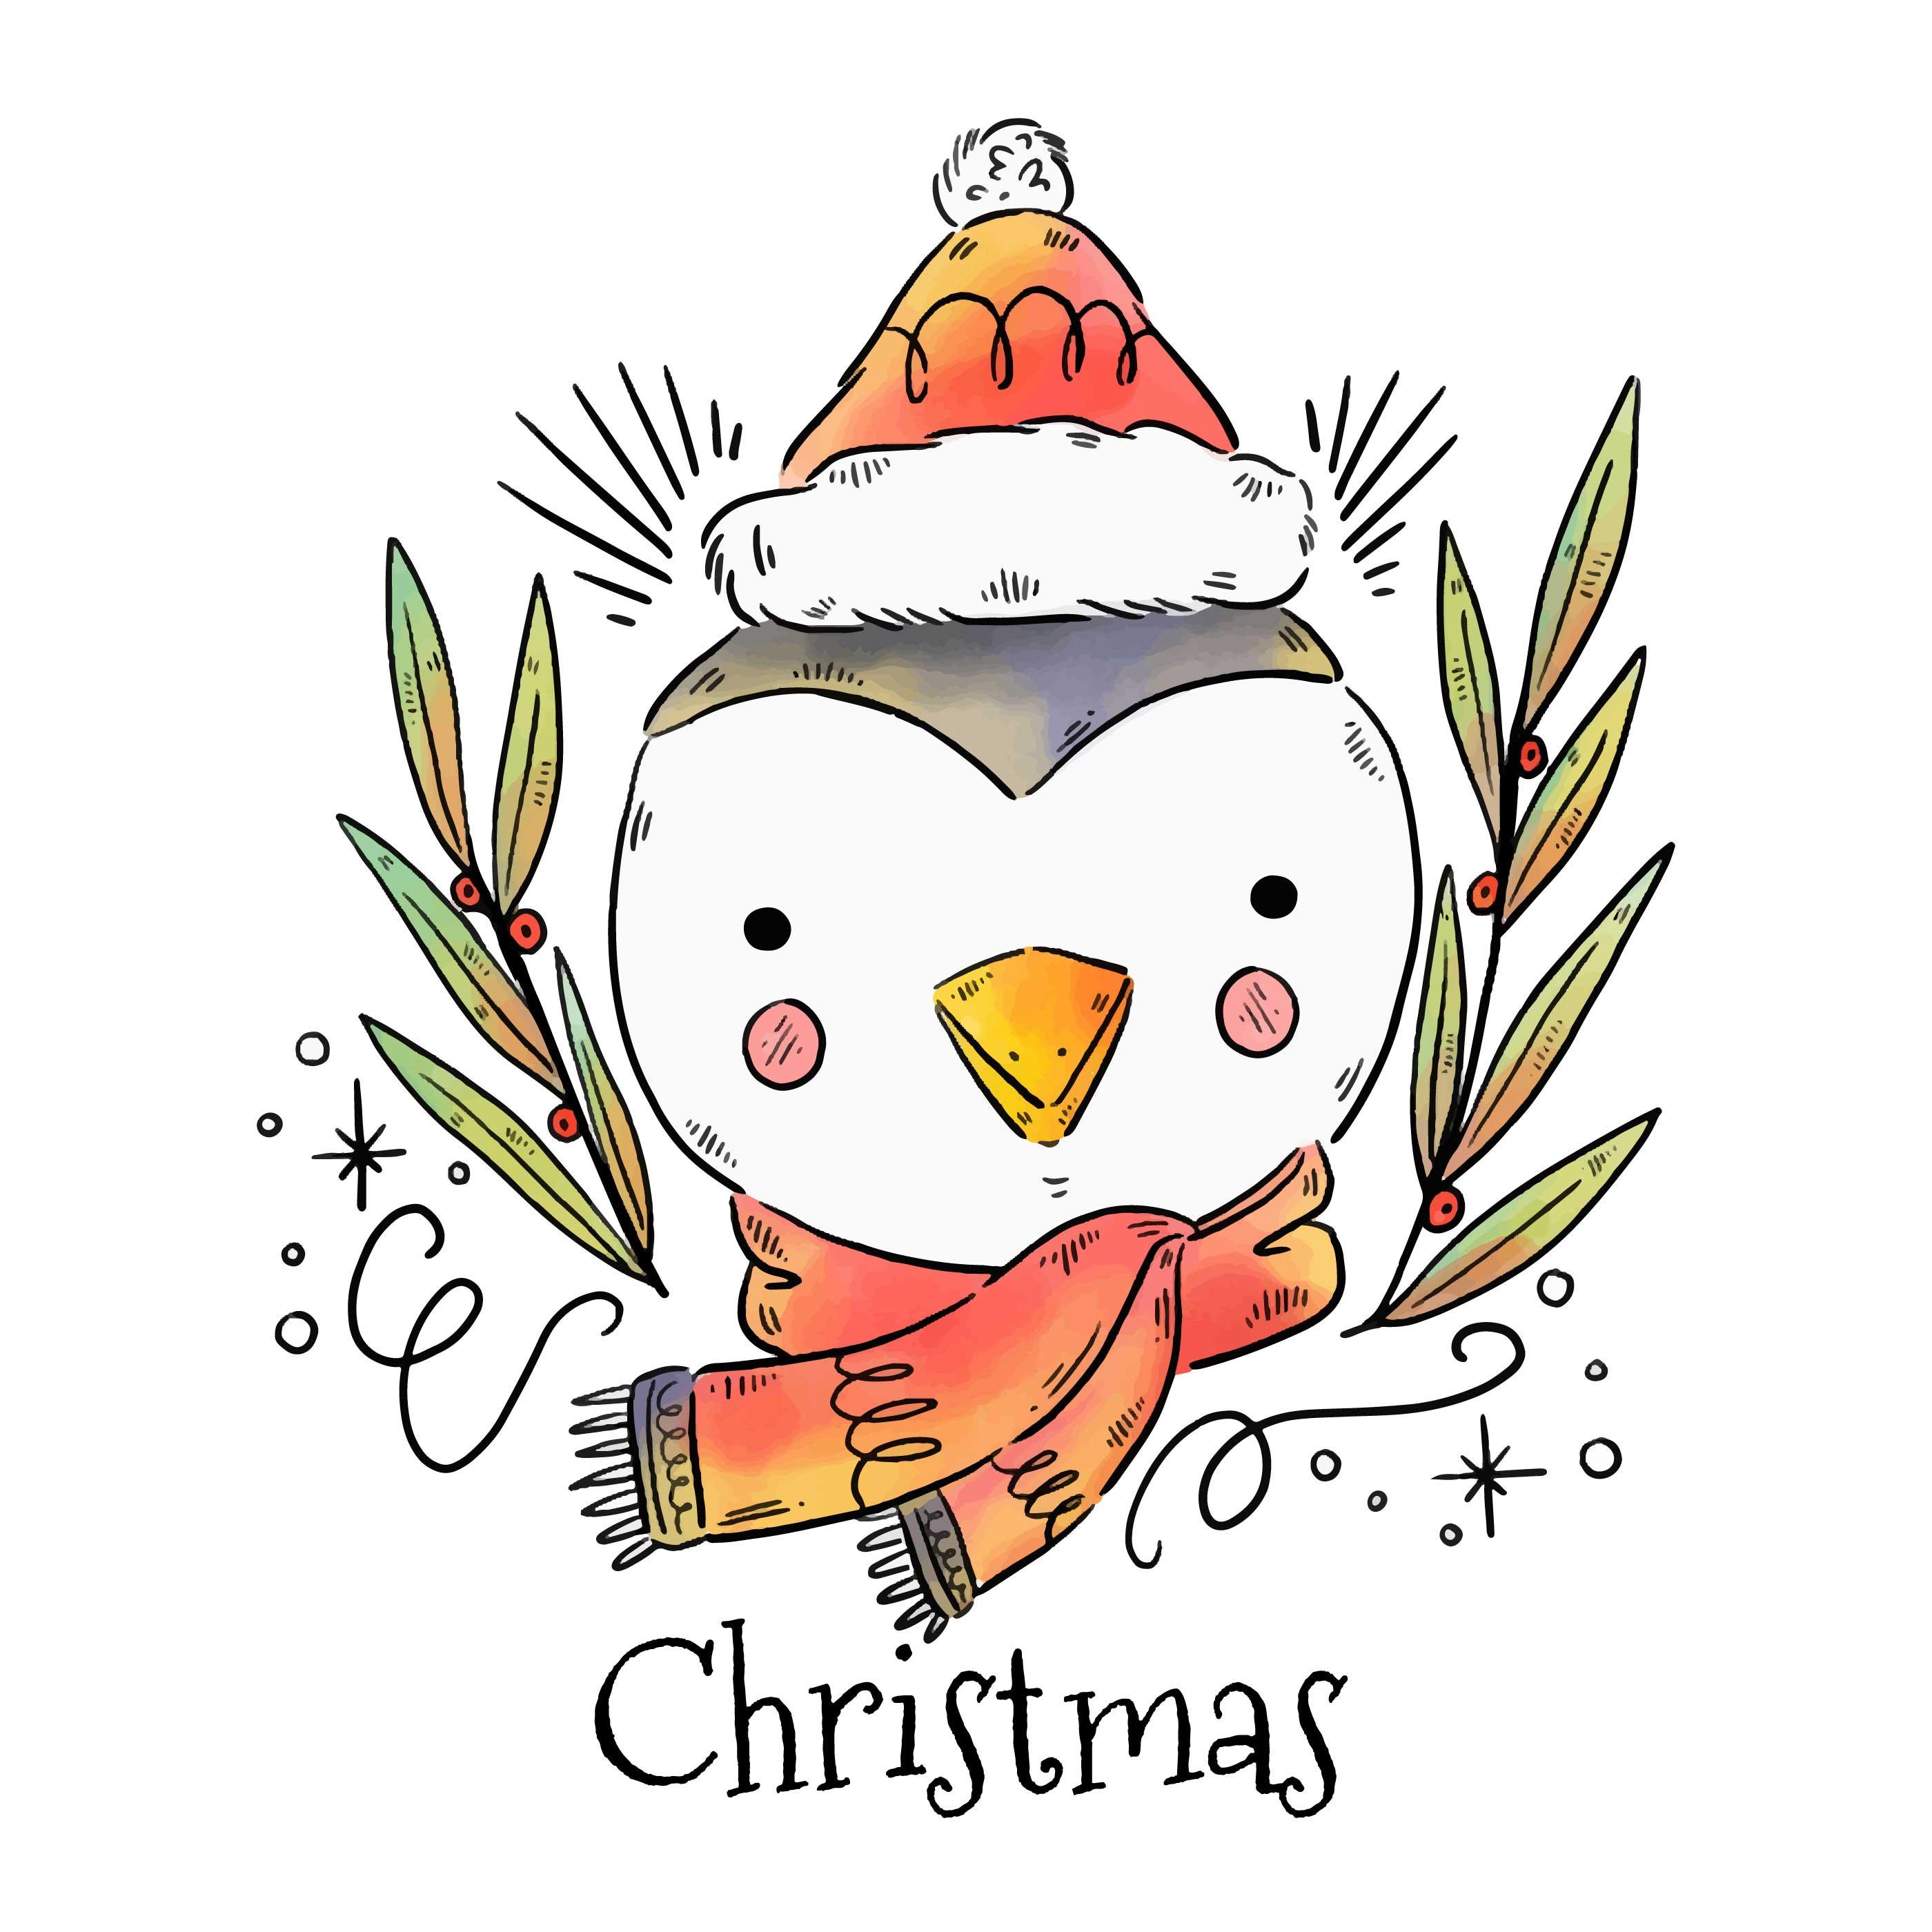 Cute Christmas Penguin Vector - Download Free Vectors ...